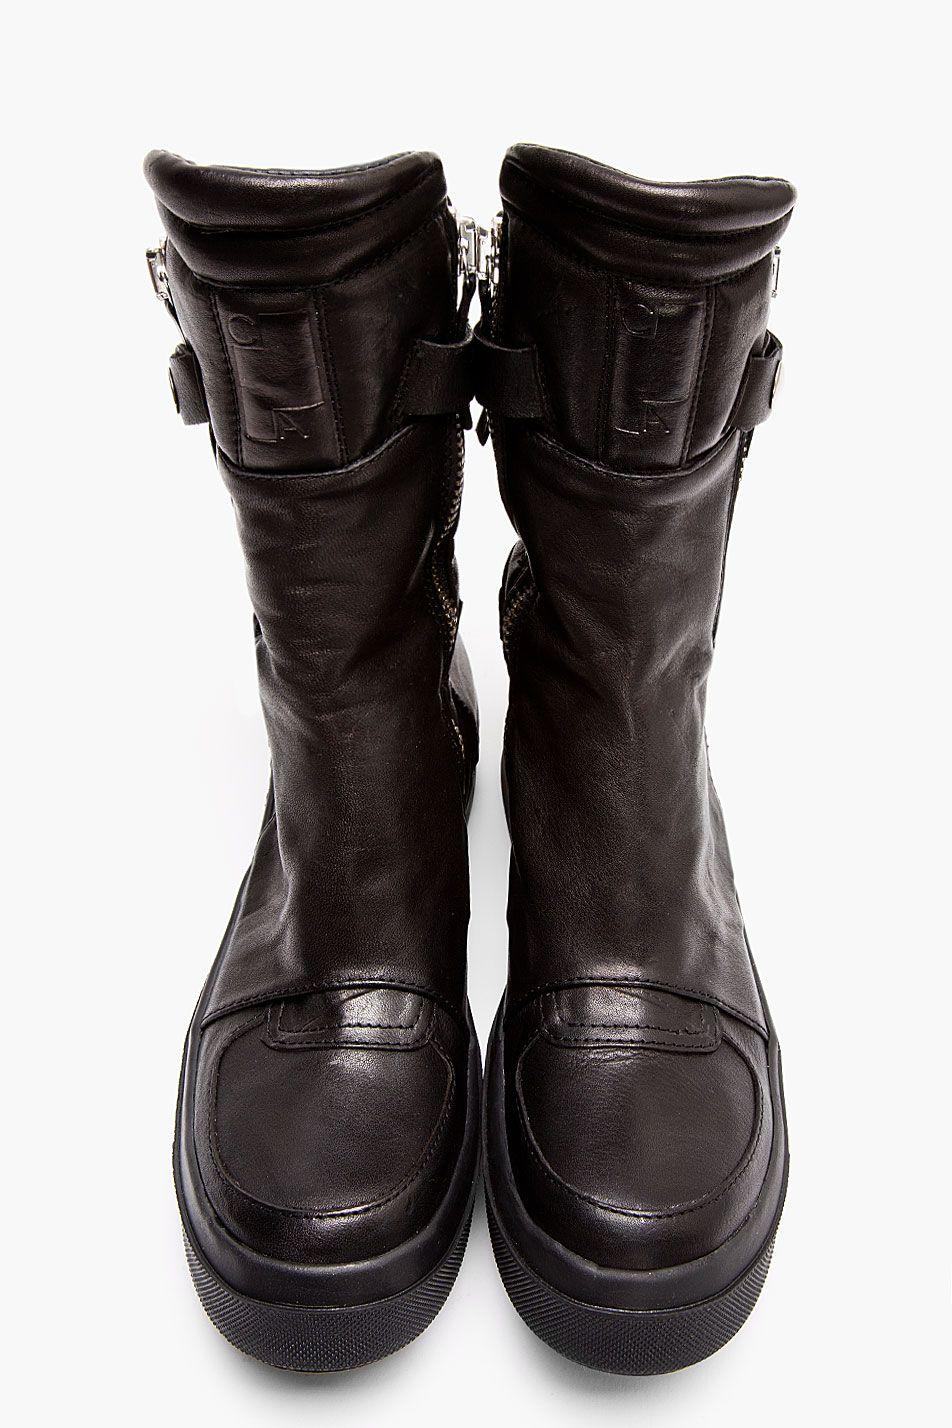 CA BY CINZIA ARAIA Black Leather New Jump Boots